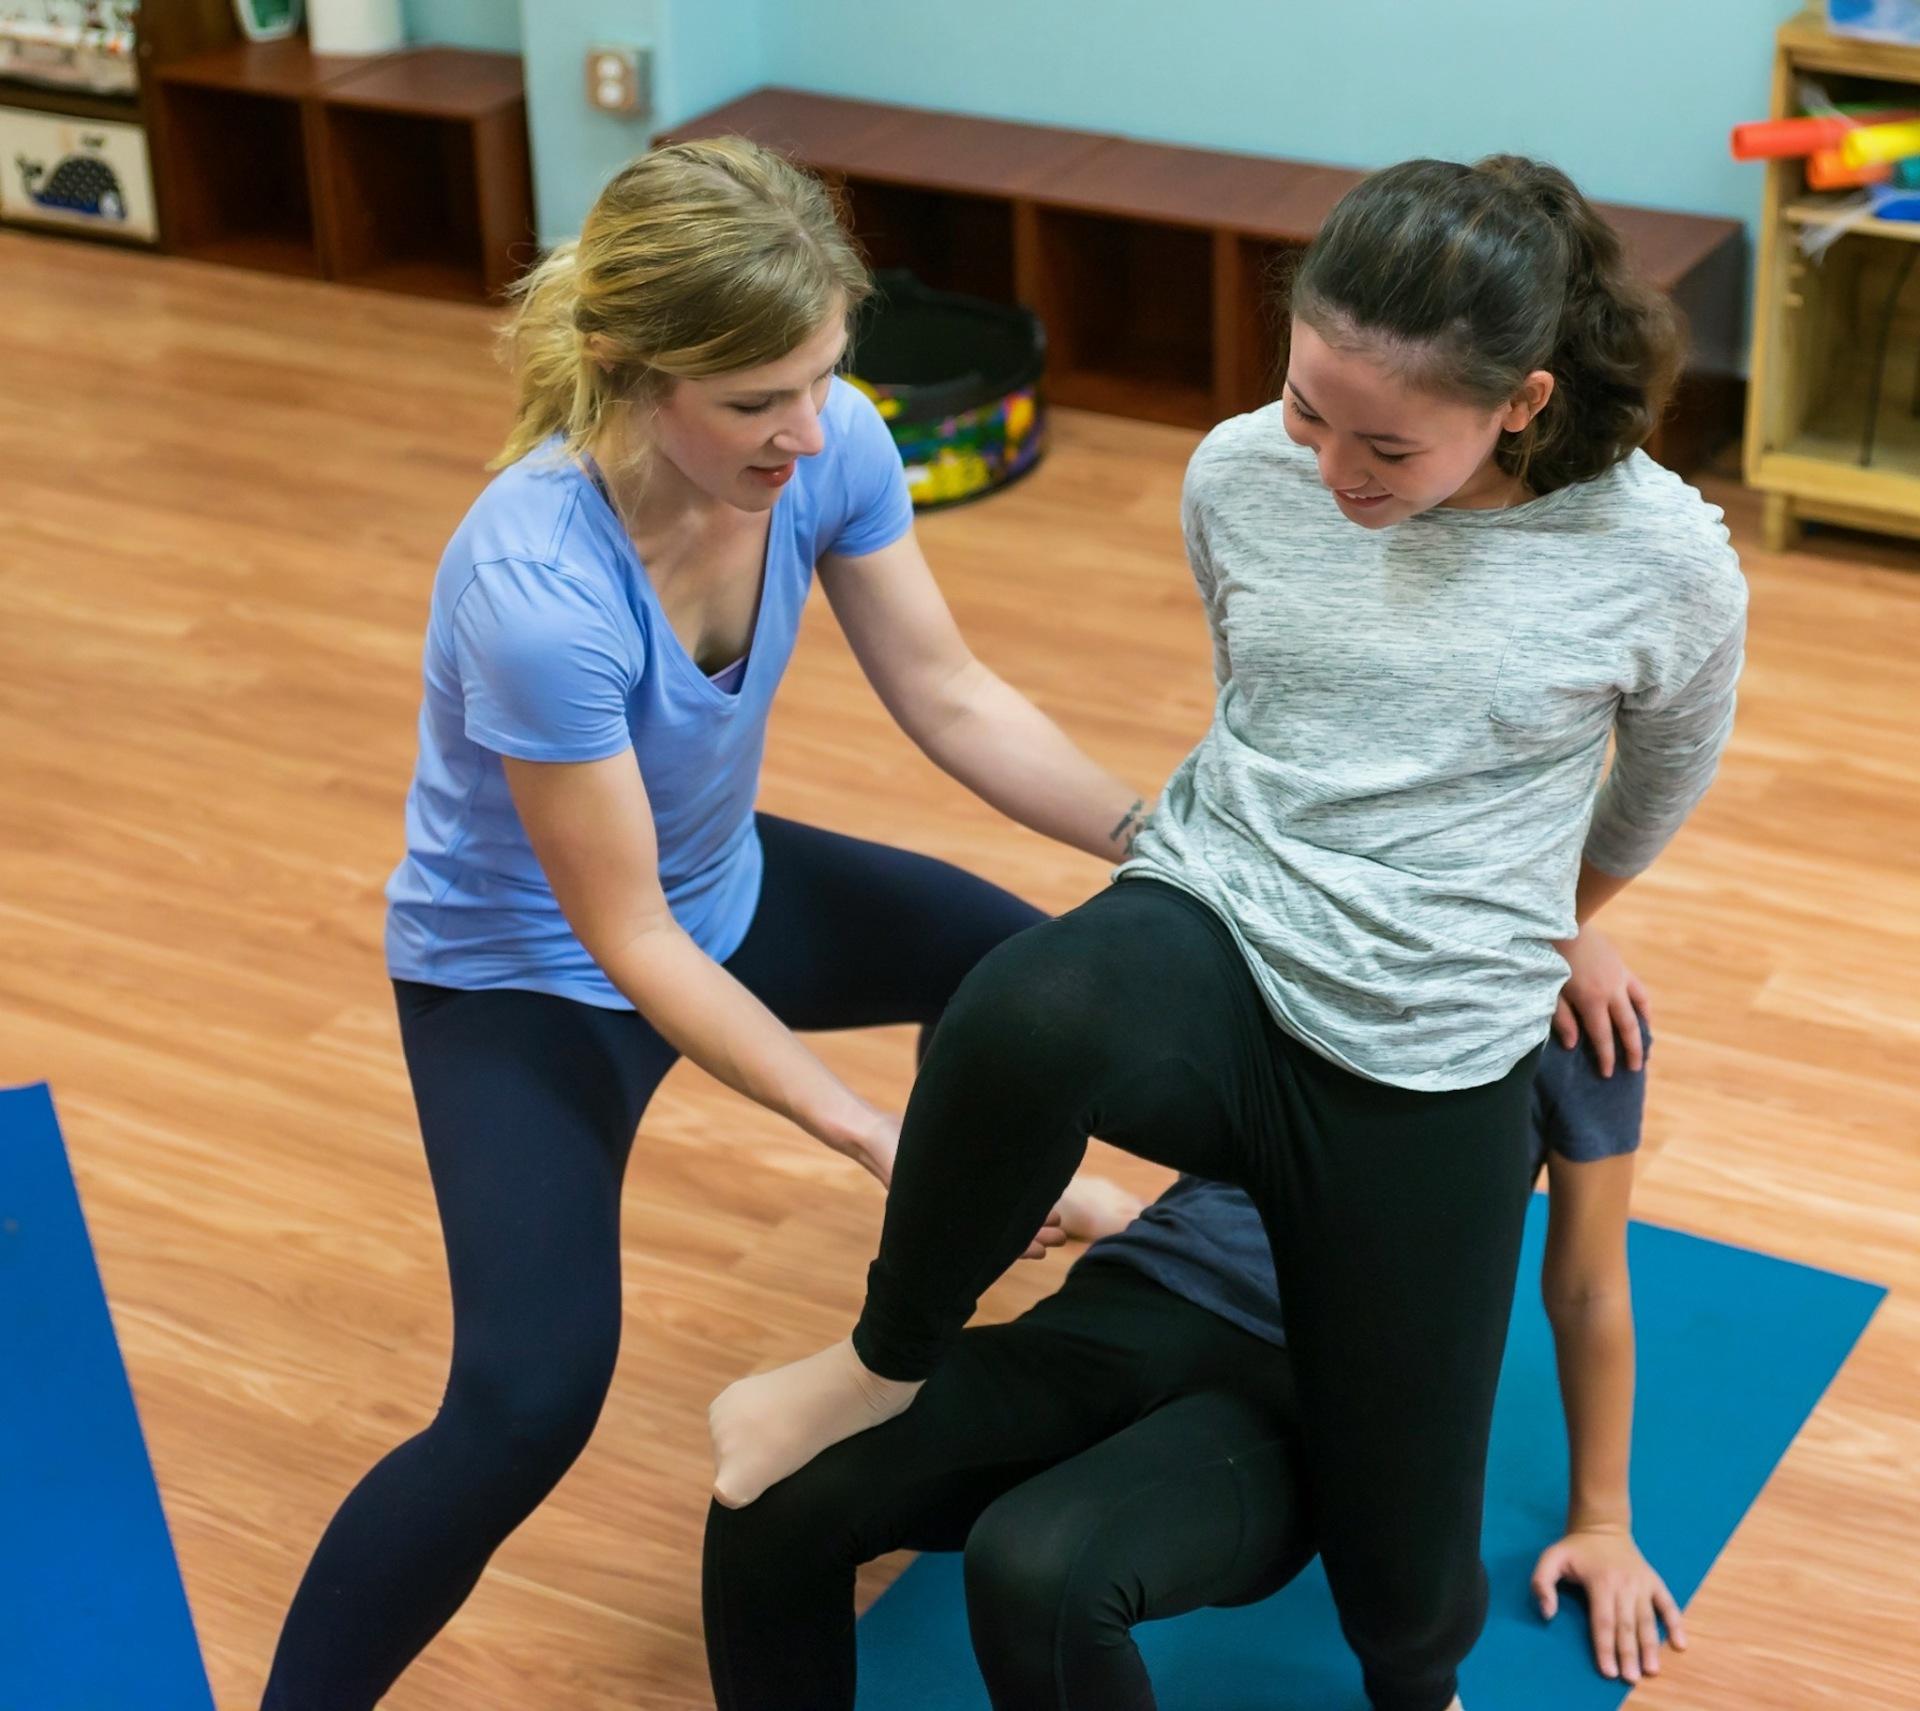 teen yoga class, yoga class, partner pose